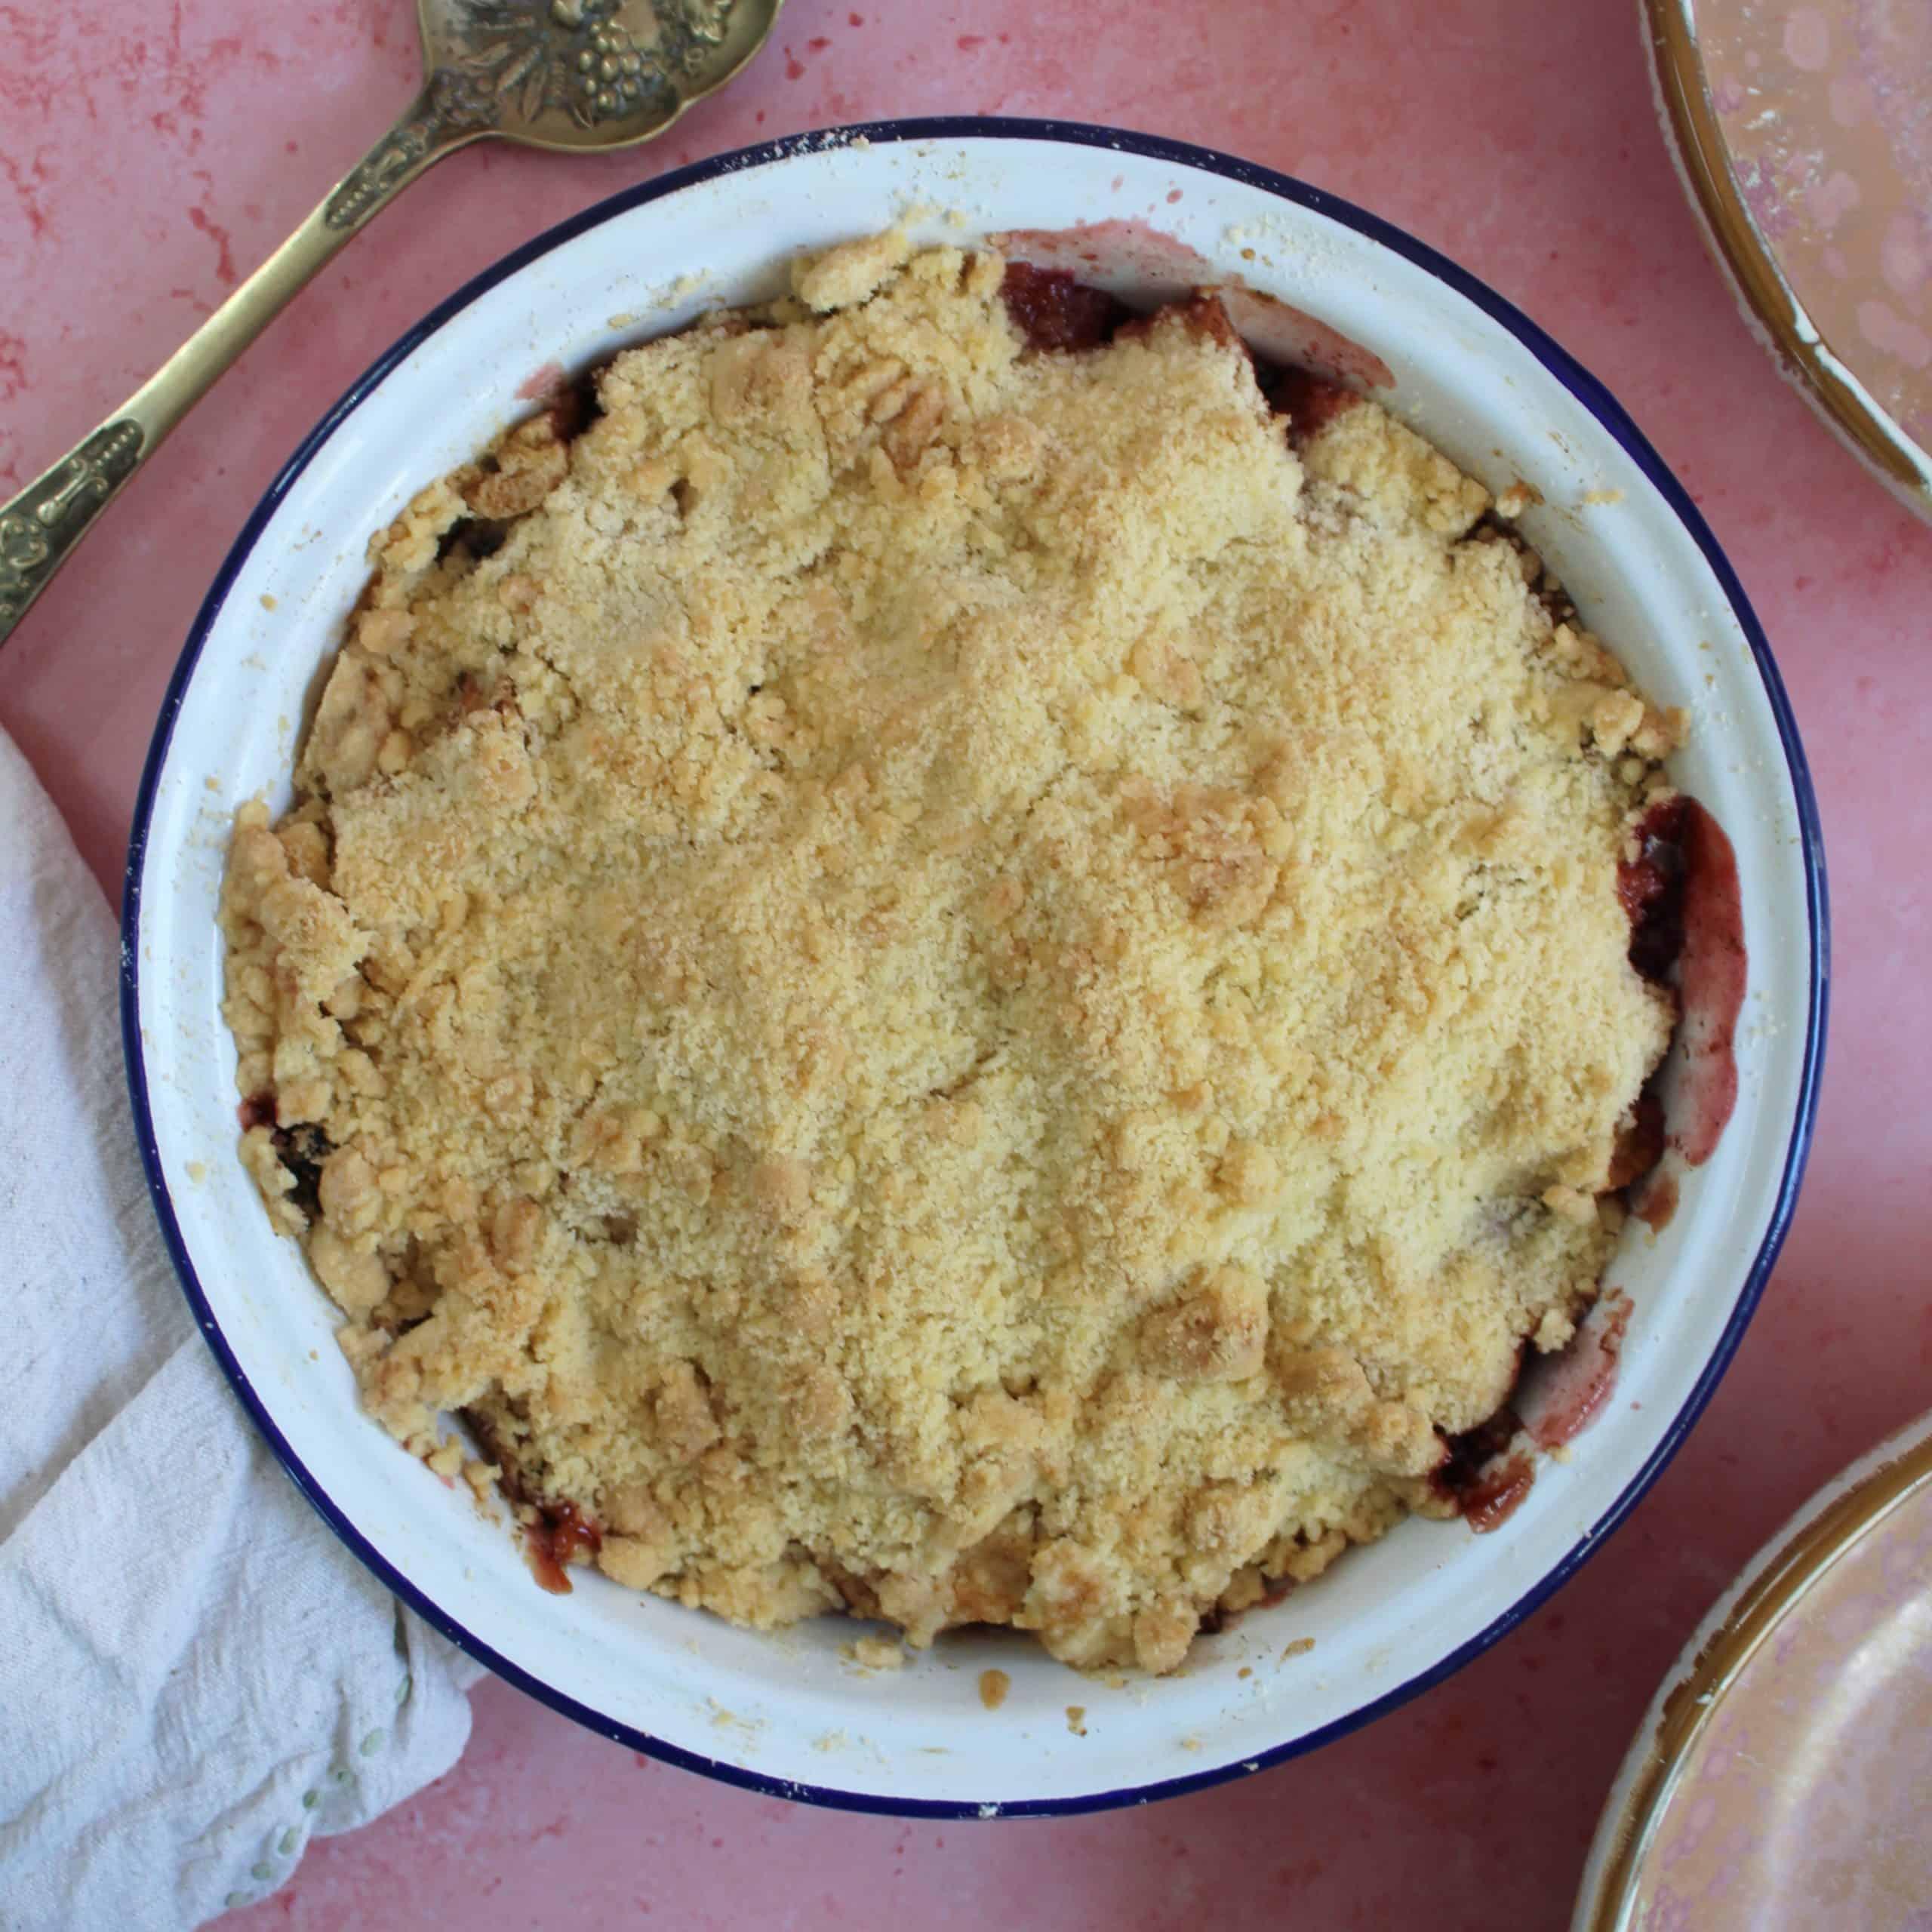 gluten free crumble recipe